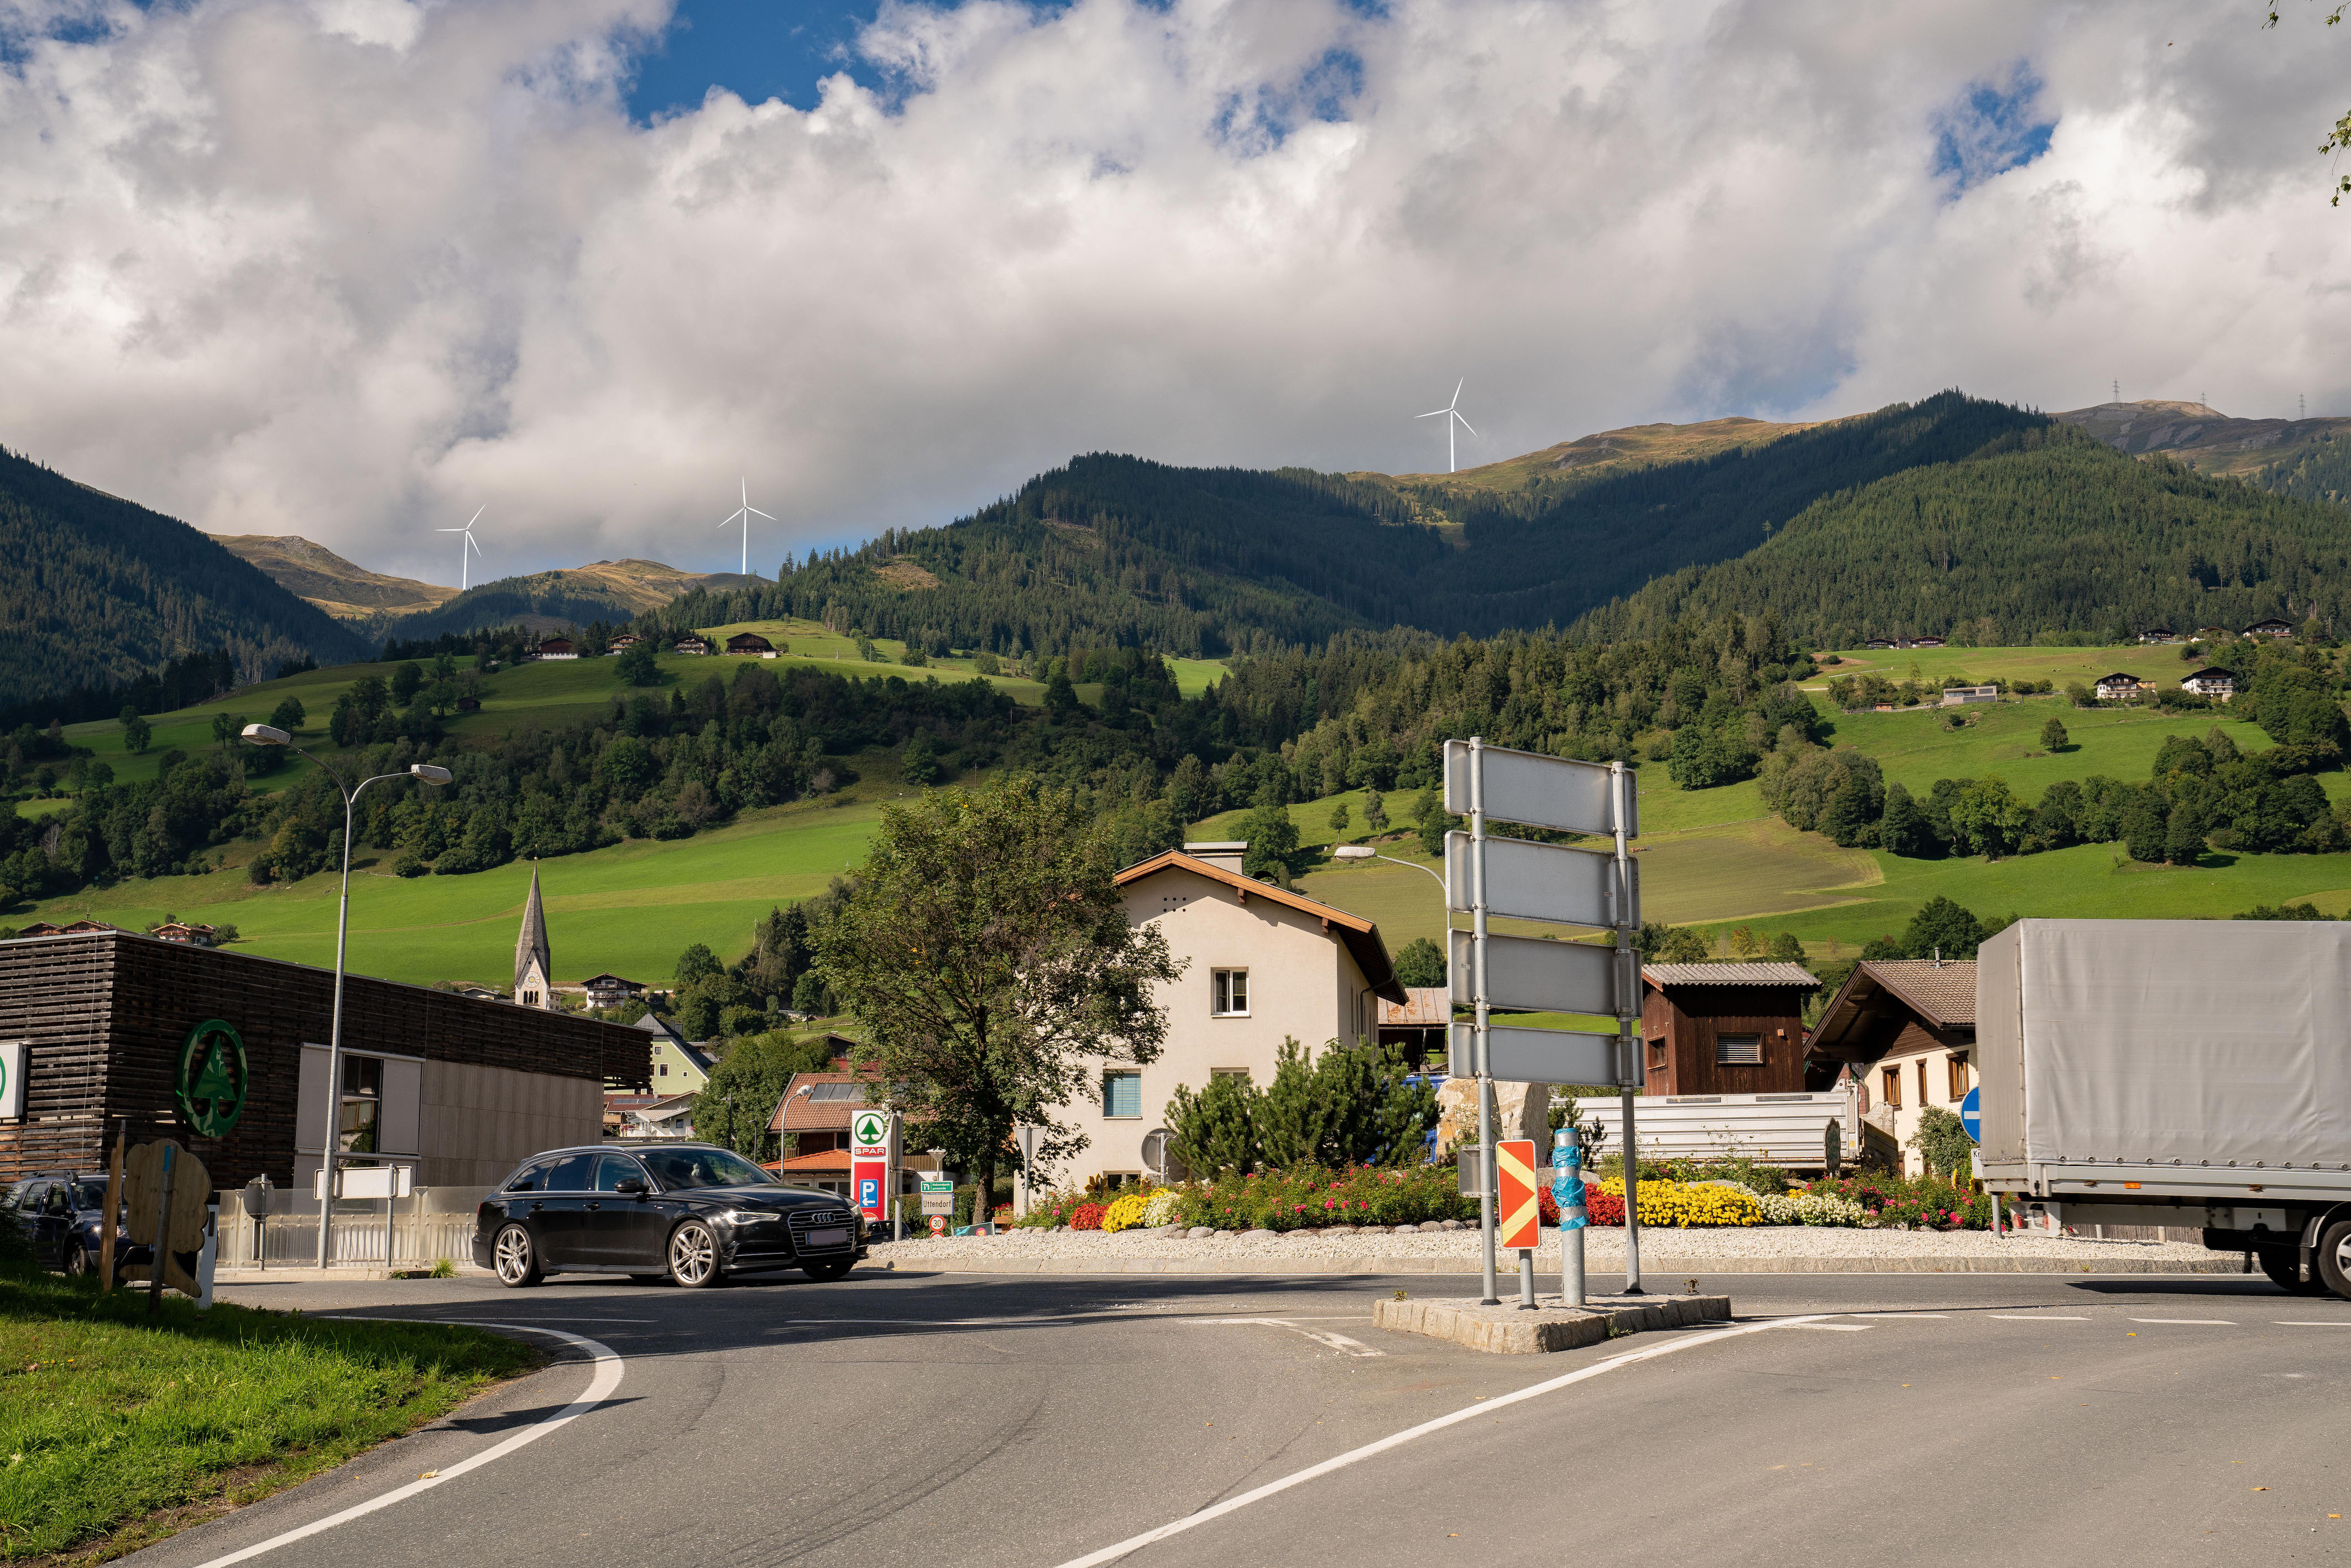 WINDPARK-Oberpinzgau